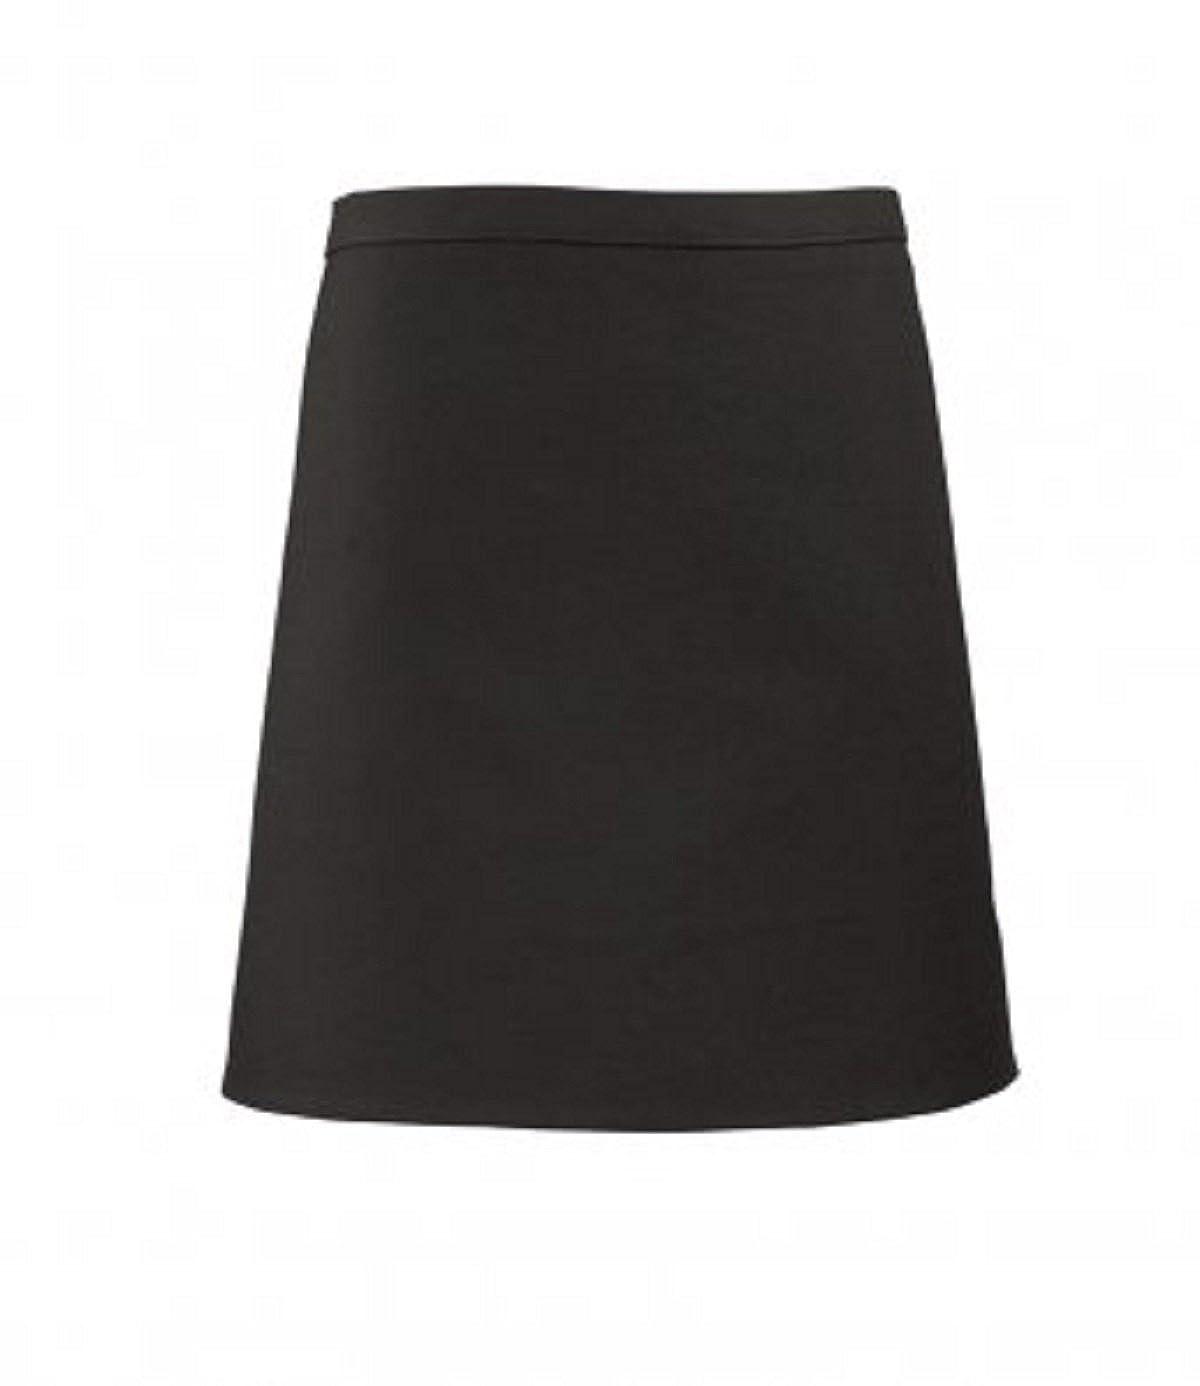 New Premier Half Length Continental Style Apron Short Bar Apron One Size